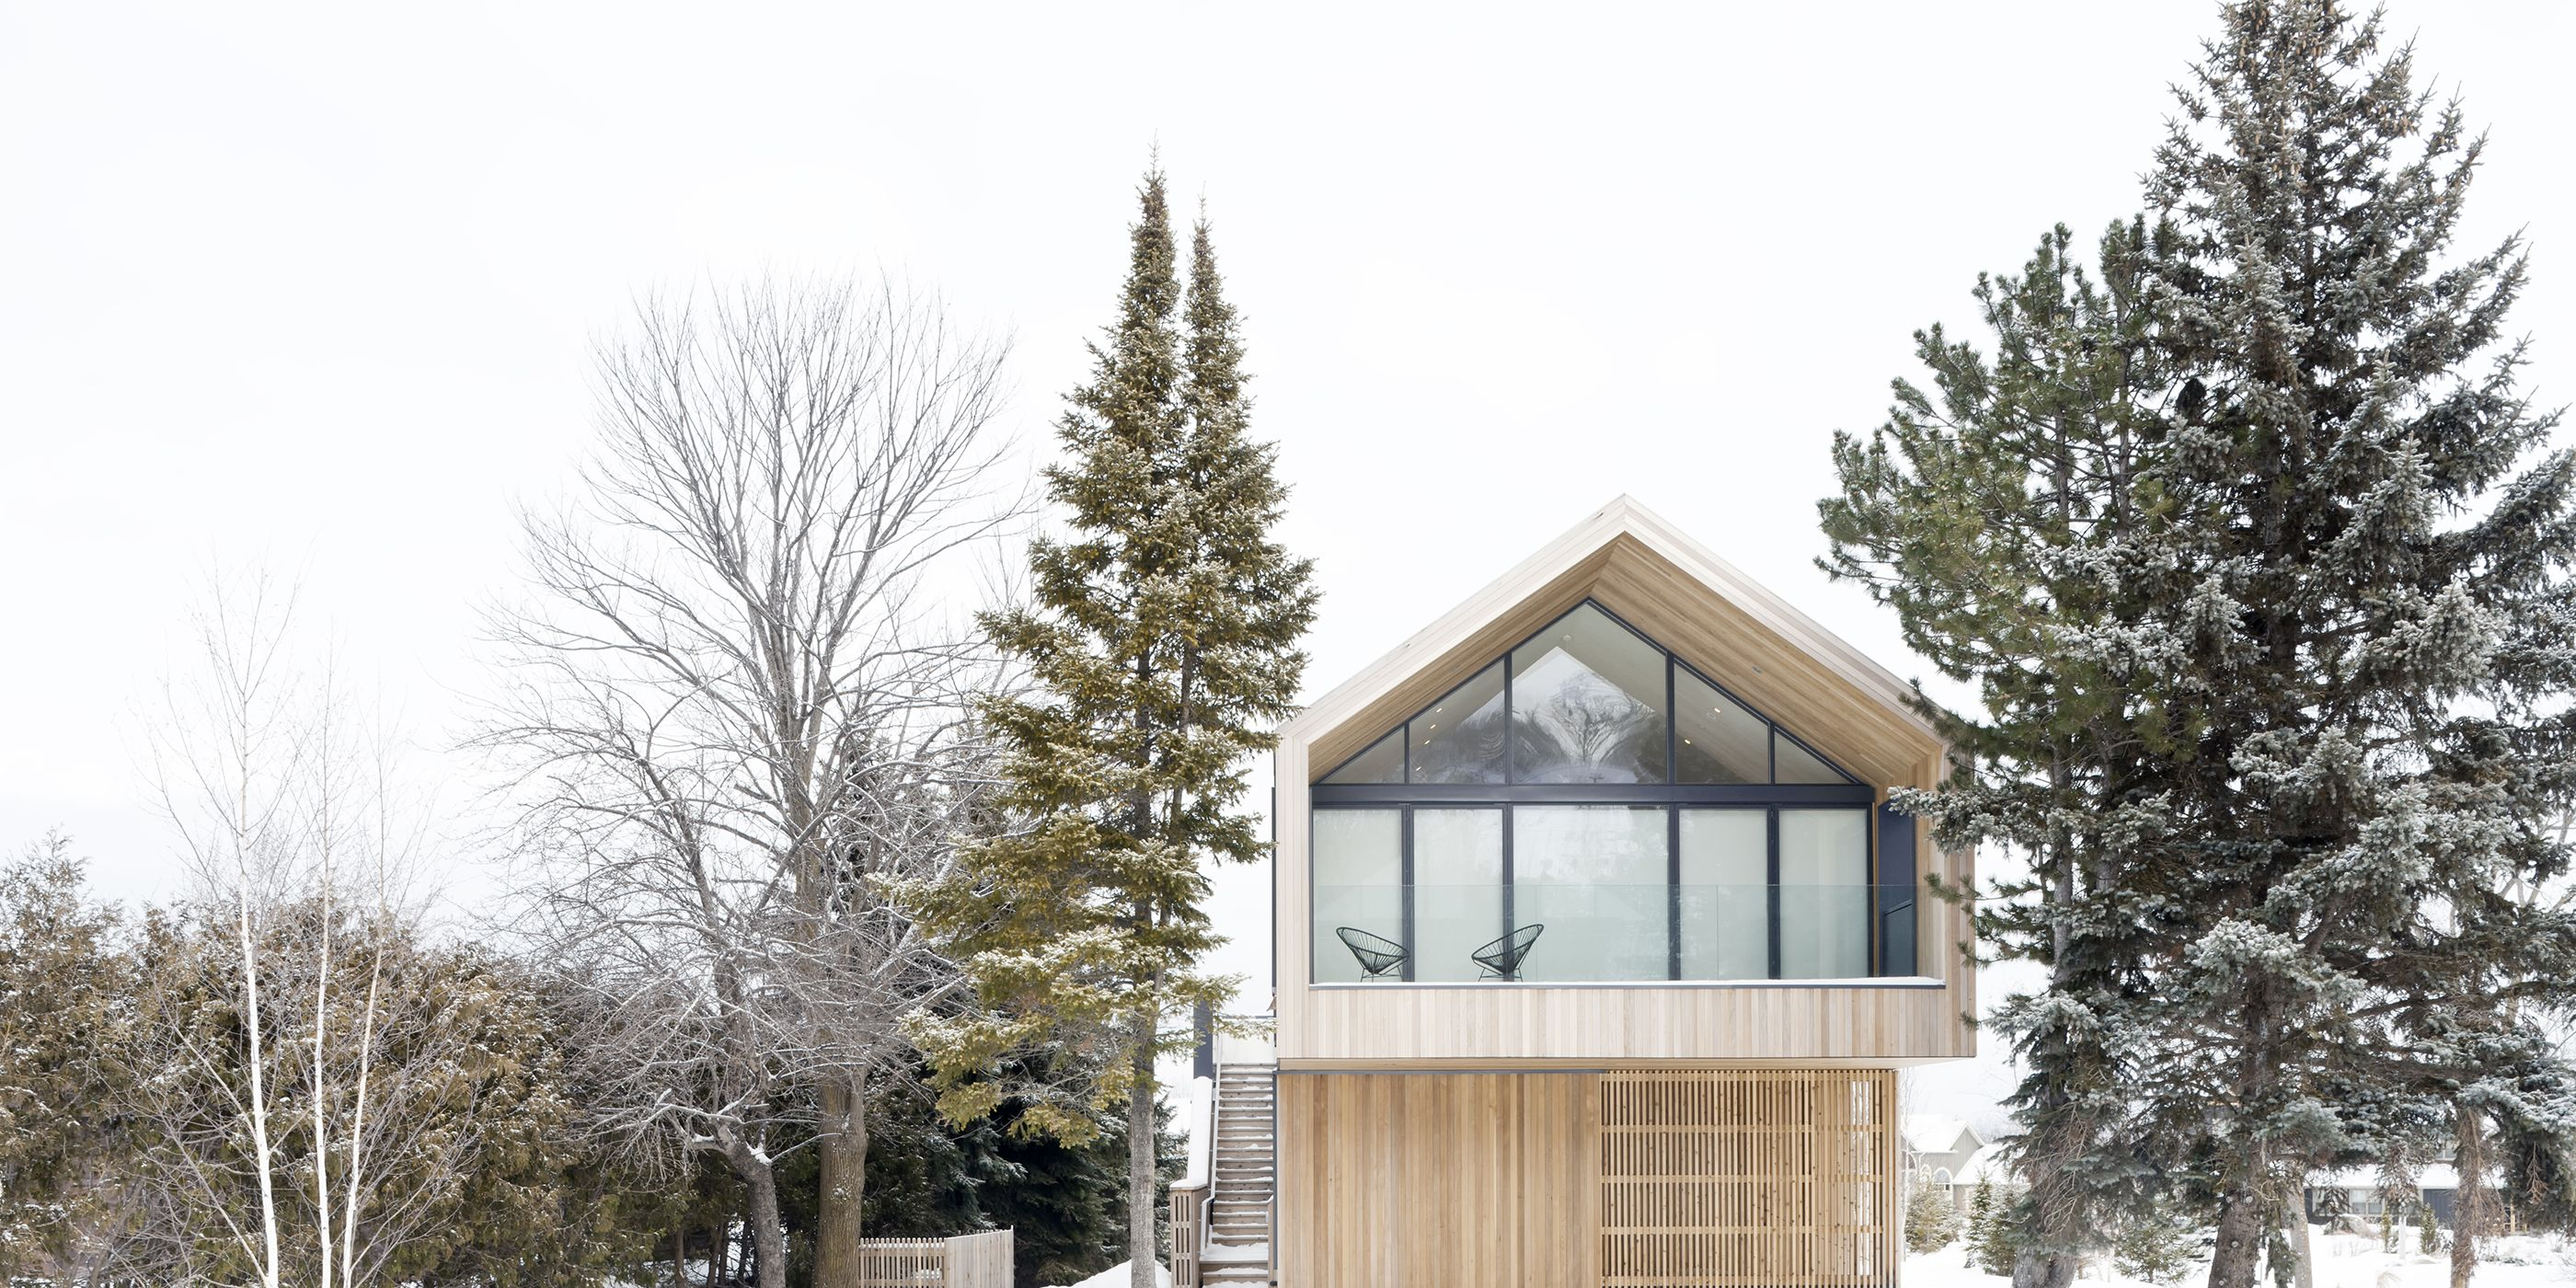 Atelier Kastelic Buffey, Maison Glissade, Collingwood, Ontario, Canada